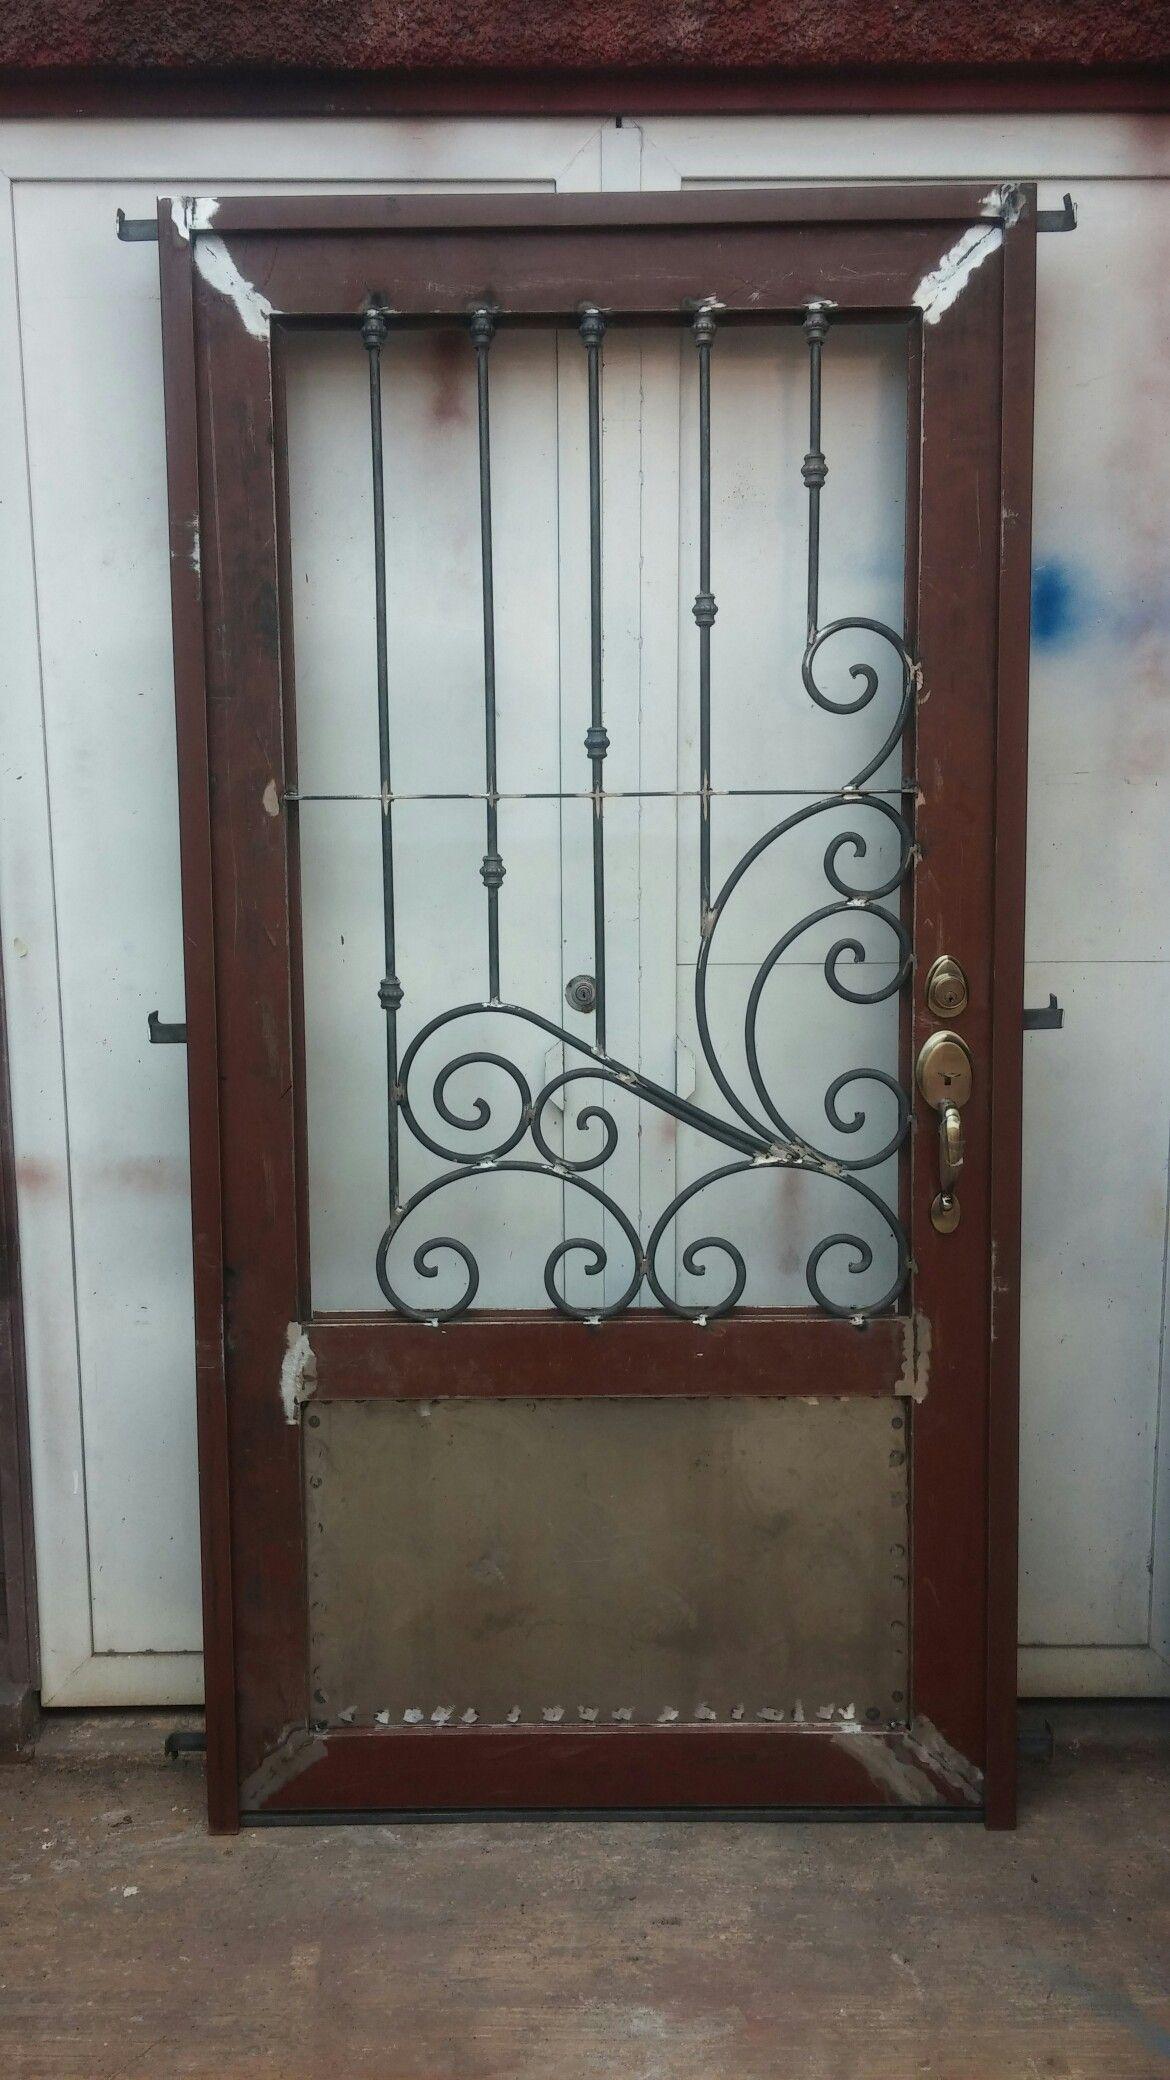 Pin De Amammamannaaaaaasyvmmmmmmmmmmm En Diseno Puertas De Hierro Puertas De Metal Modelos De Puertas